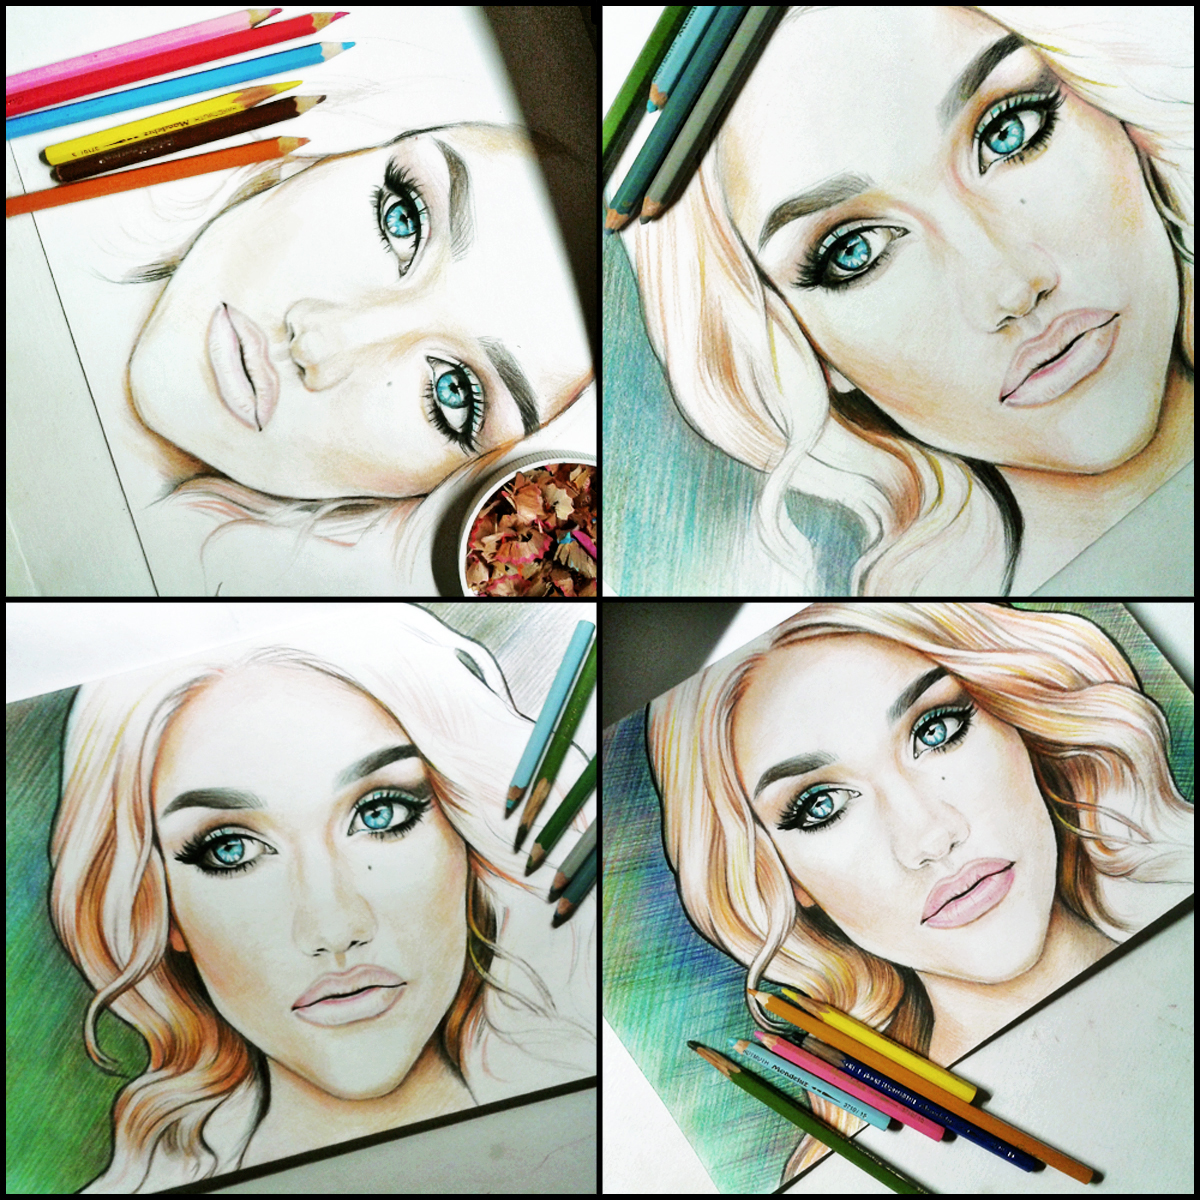 портрет - рисунок карандашими (в процессе)